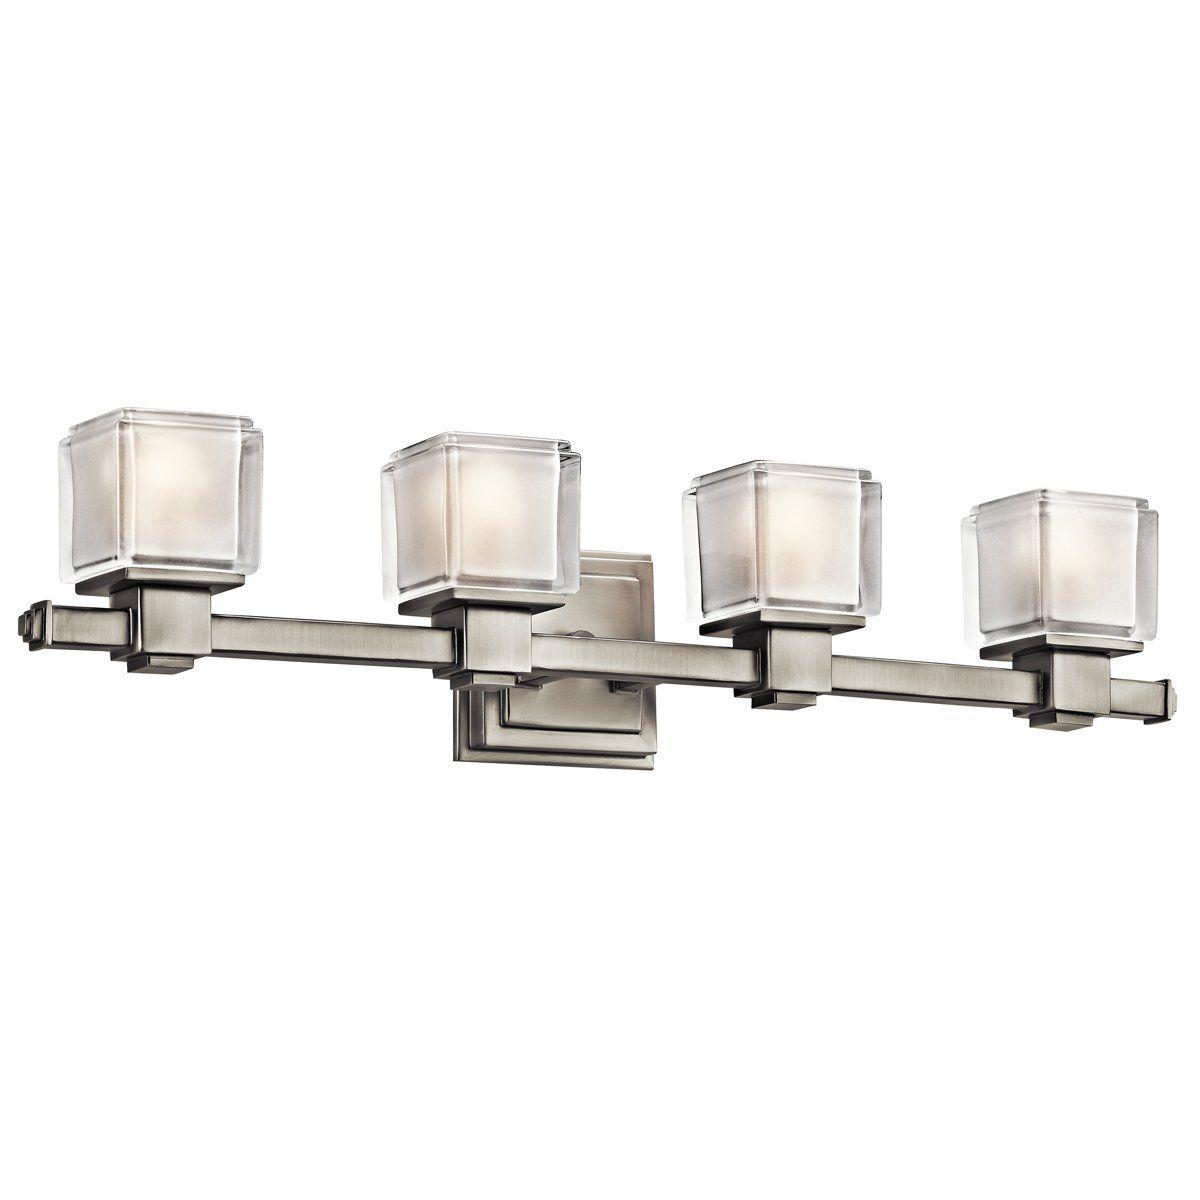 Bathroom Lighting Universe kichler lighting 45144 rocklin 4 light bathroom light - lighting